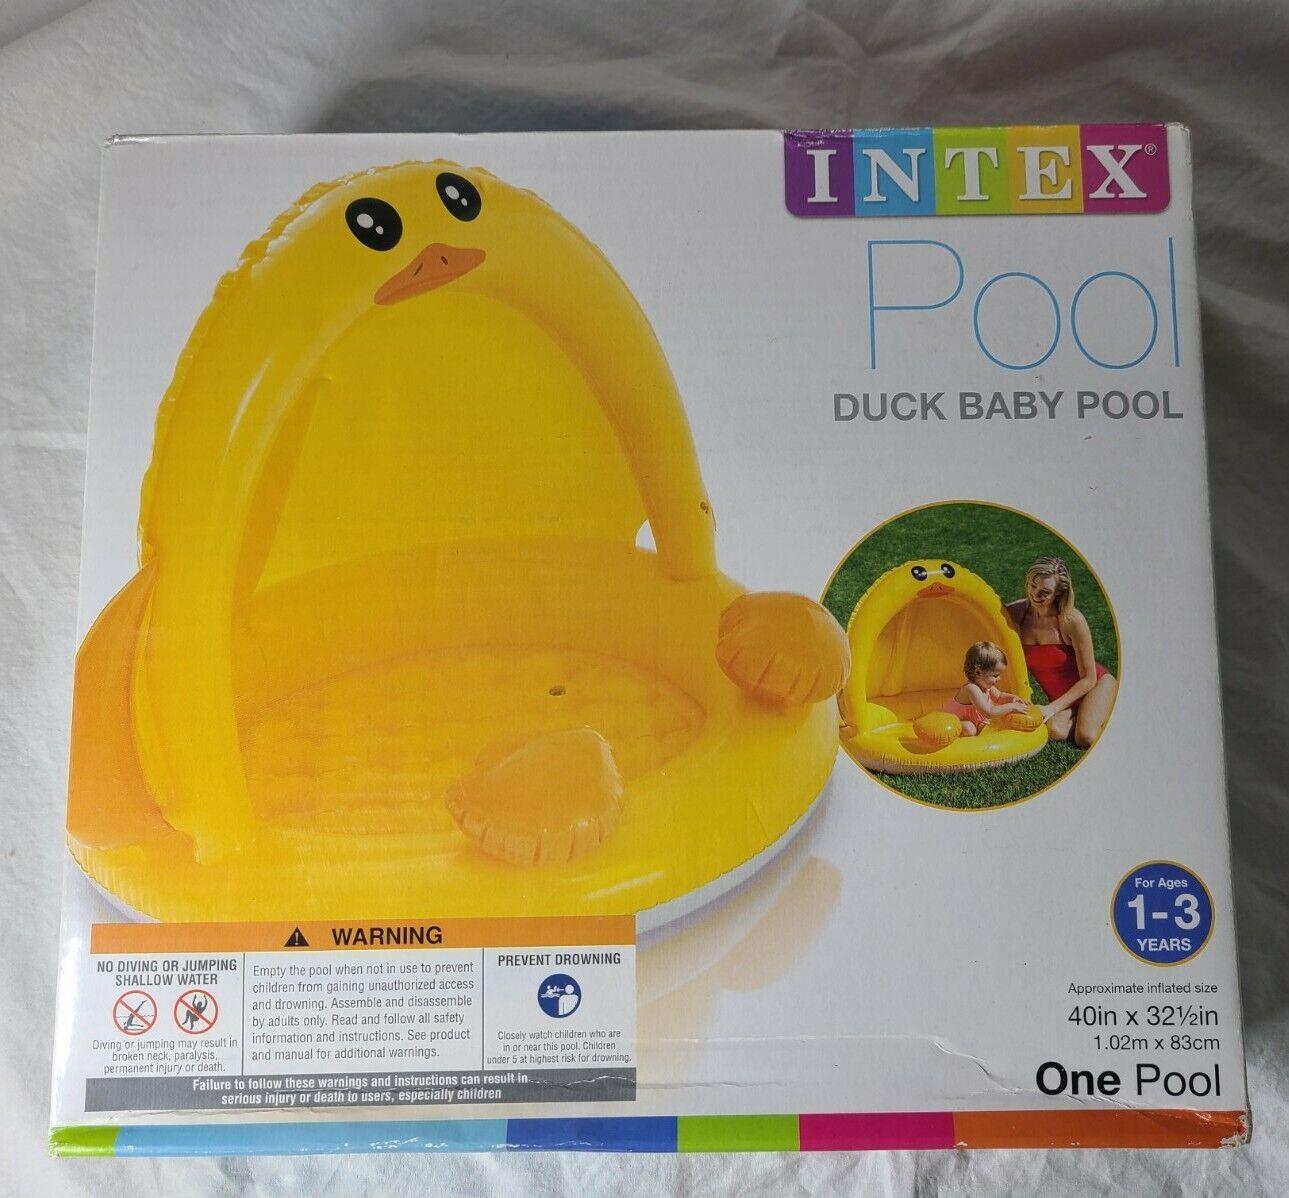 Intex Pool Duck Baby Inflatable Baby Pool, 40